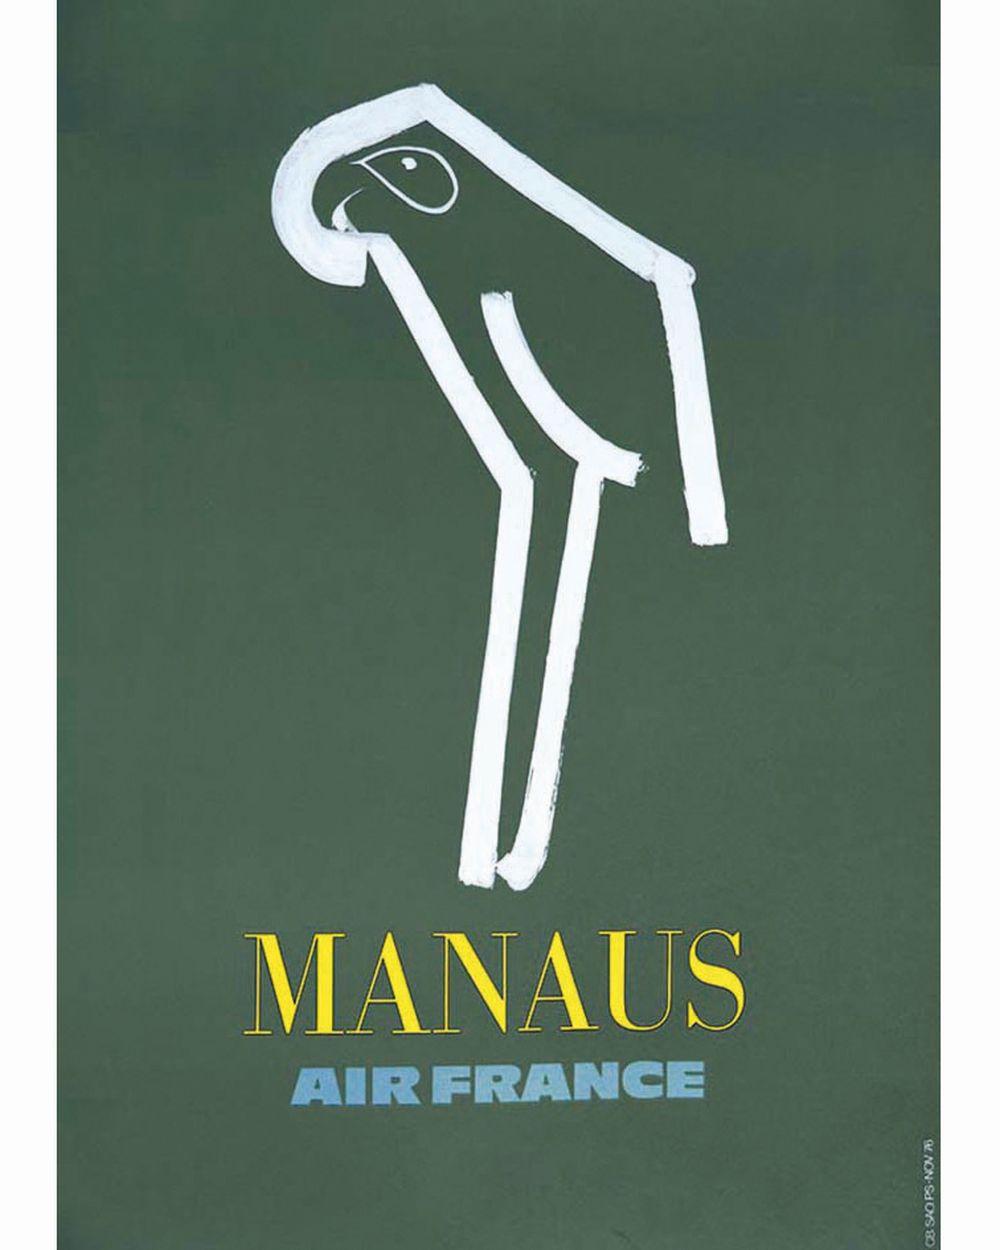 BRUNSWICK  C. - Manaus Air France     1976